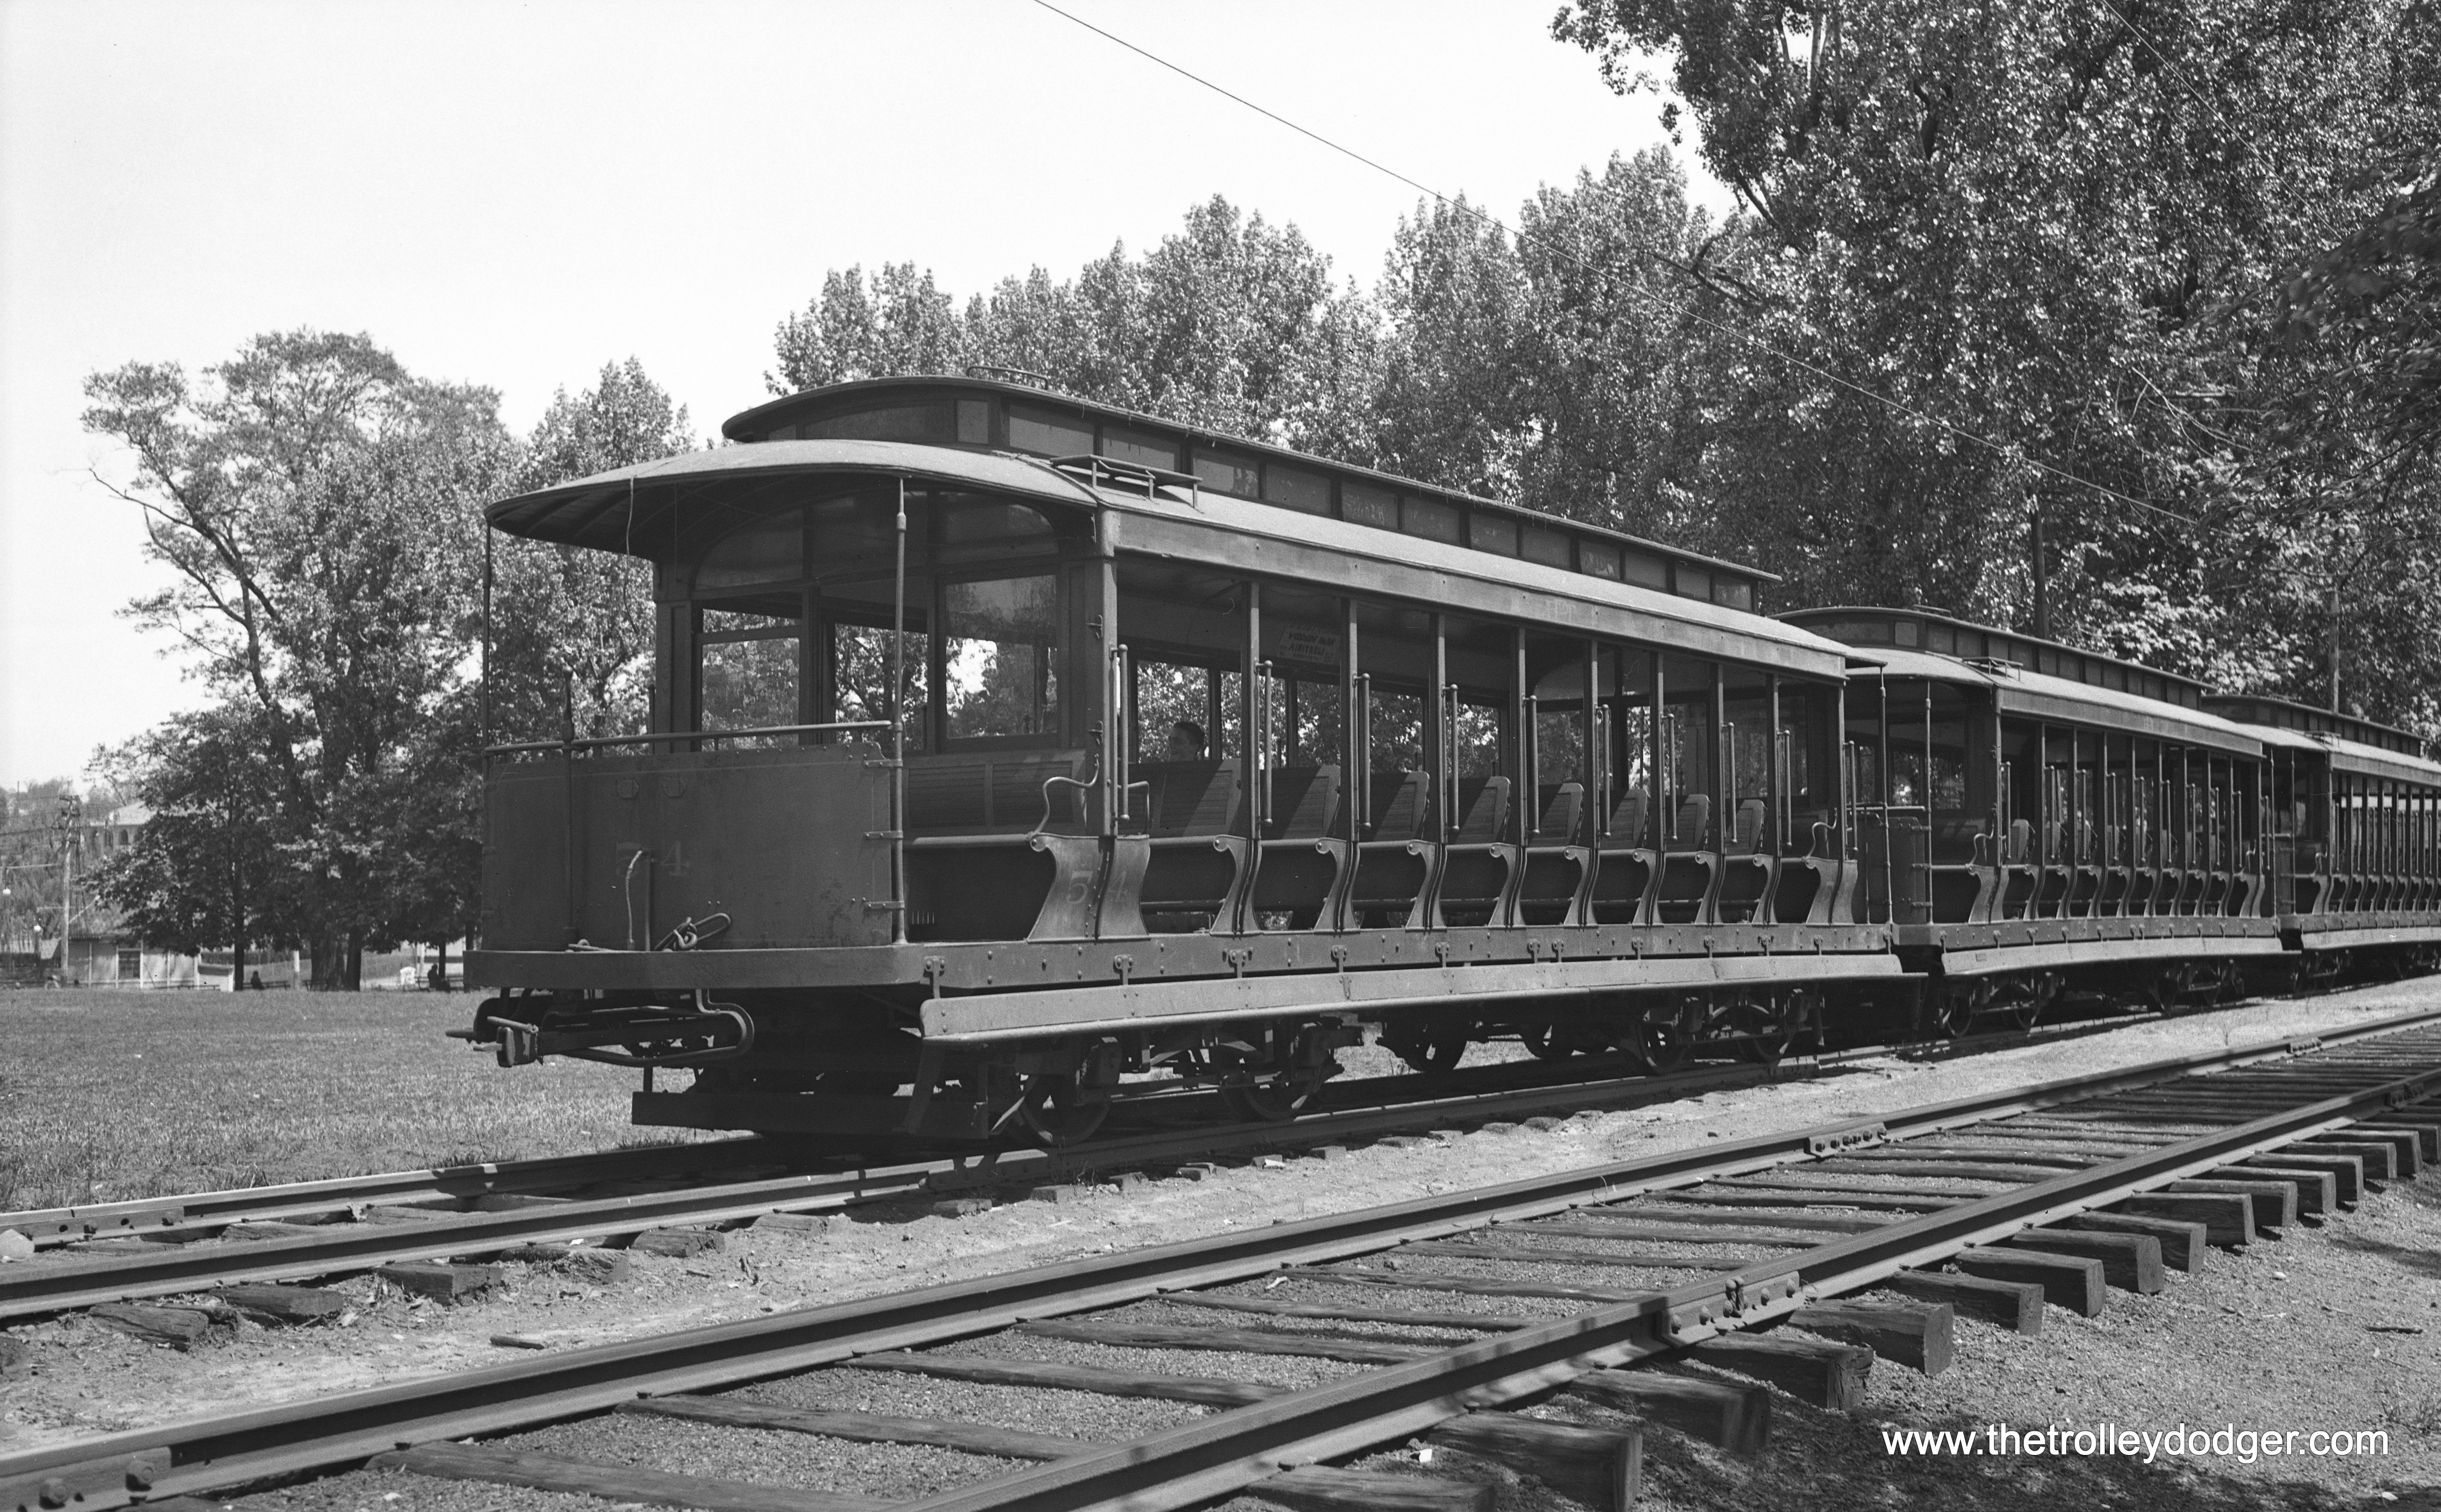 The Fairmount Park Trolley The Trolley Dodger